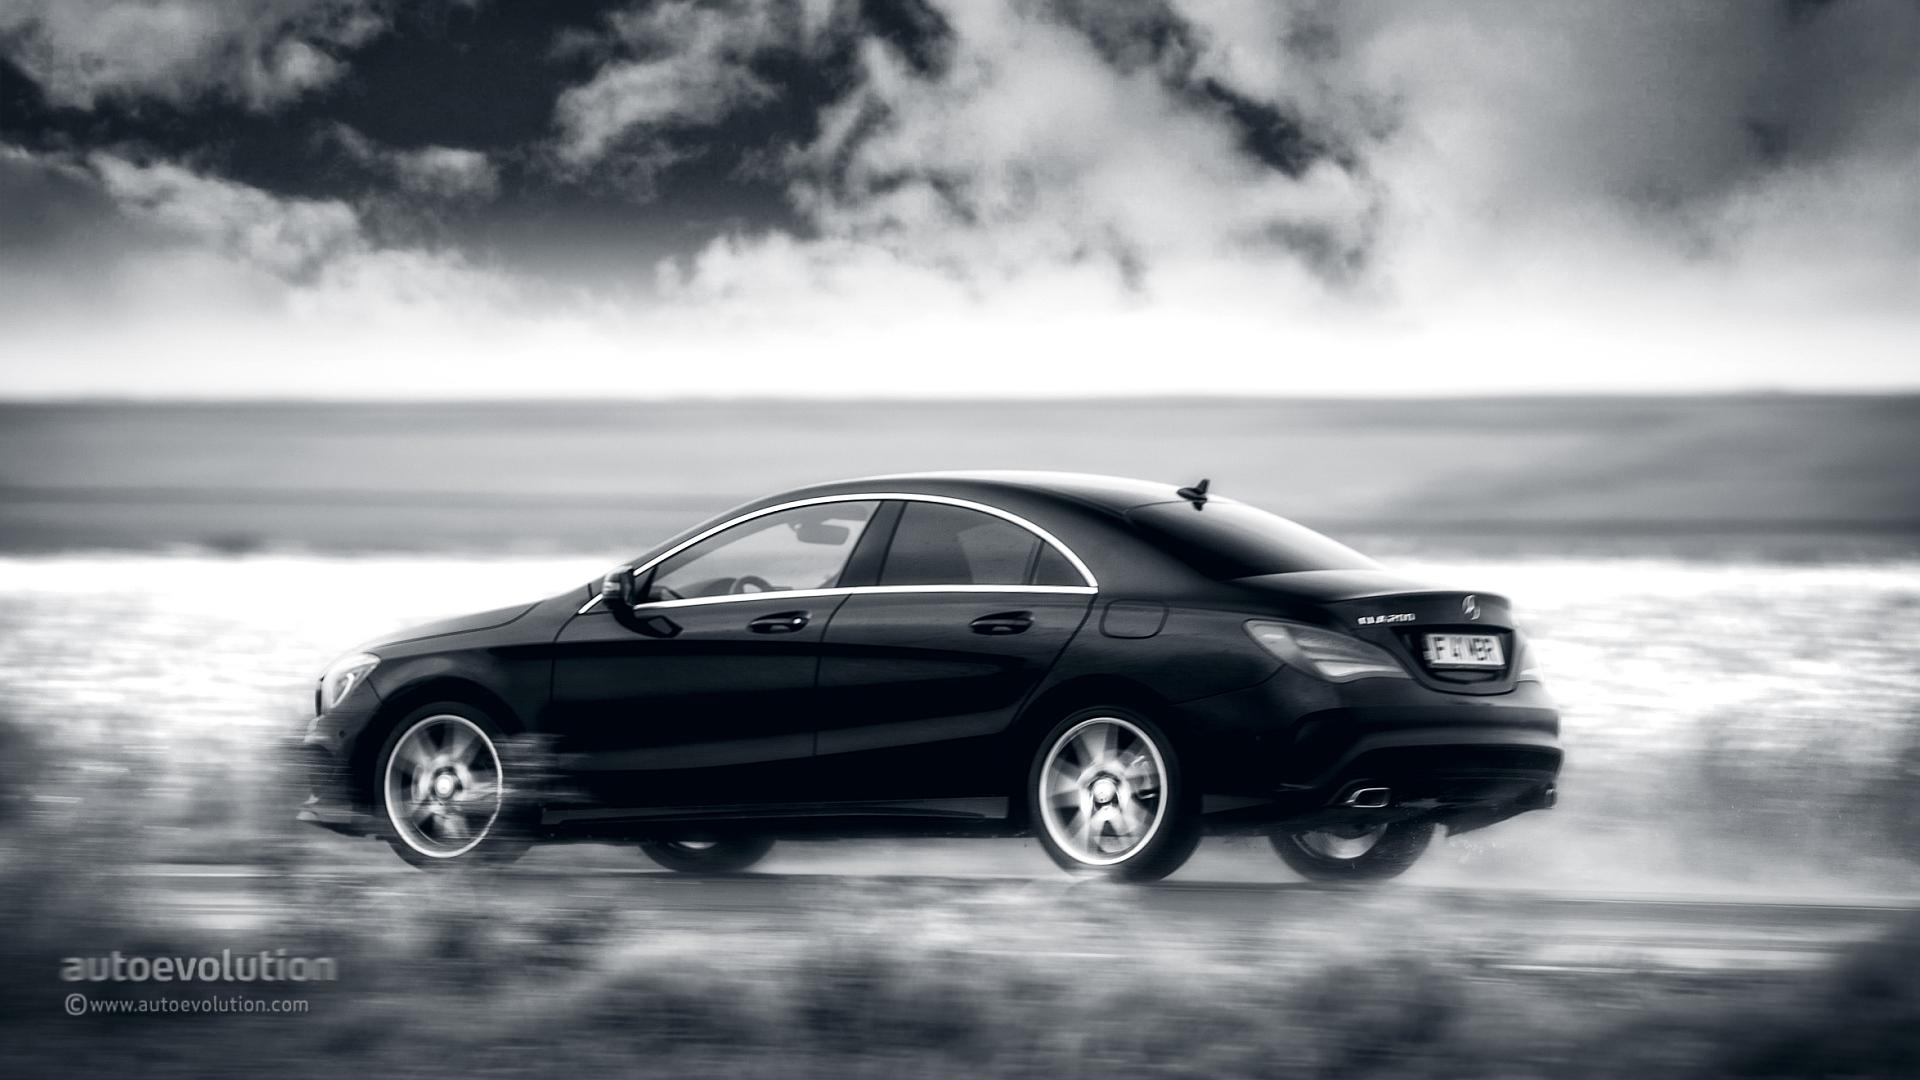 Cool Mercedes Benz Logo >> MERCEDES-BENZ CLA Review - autoevolution